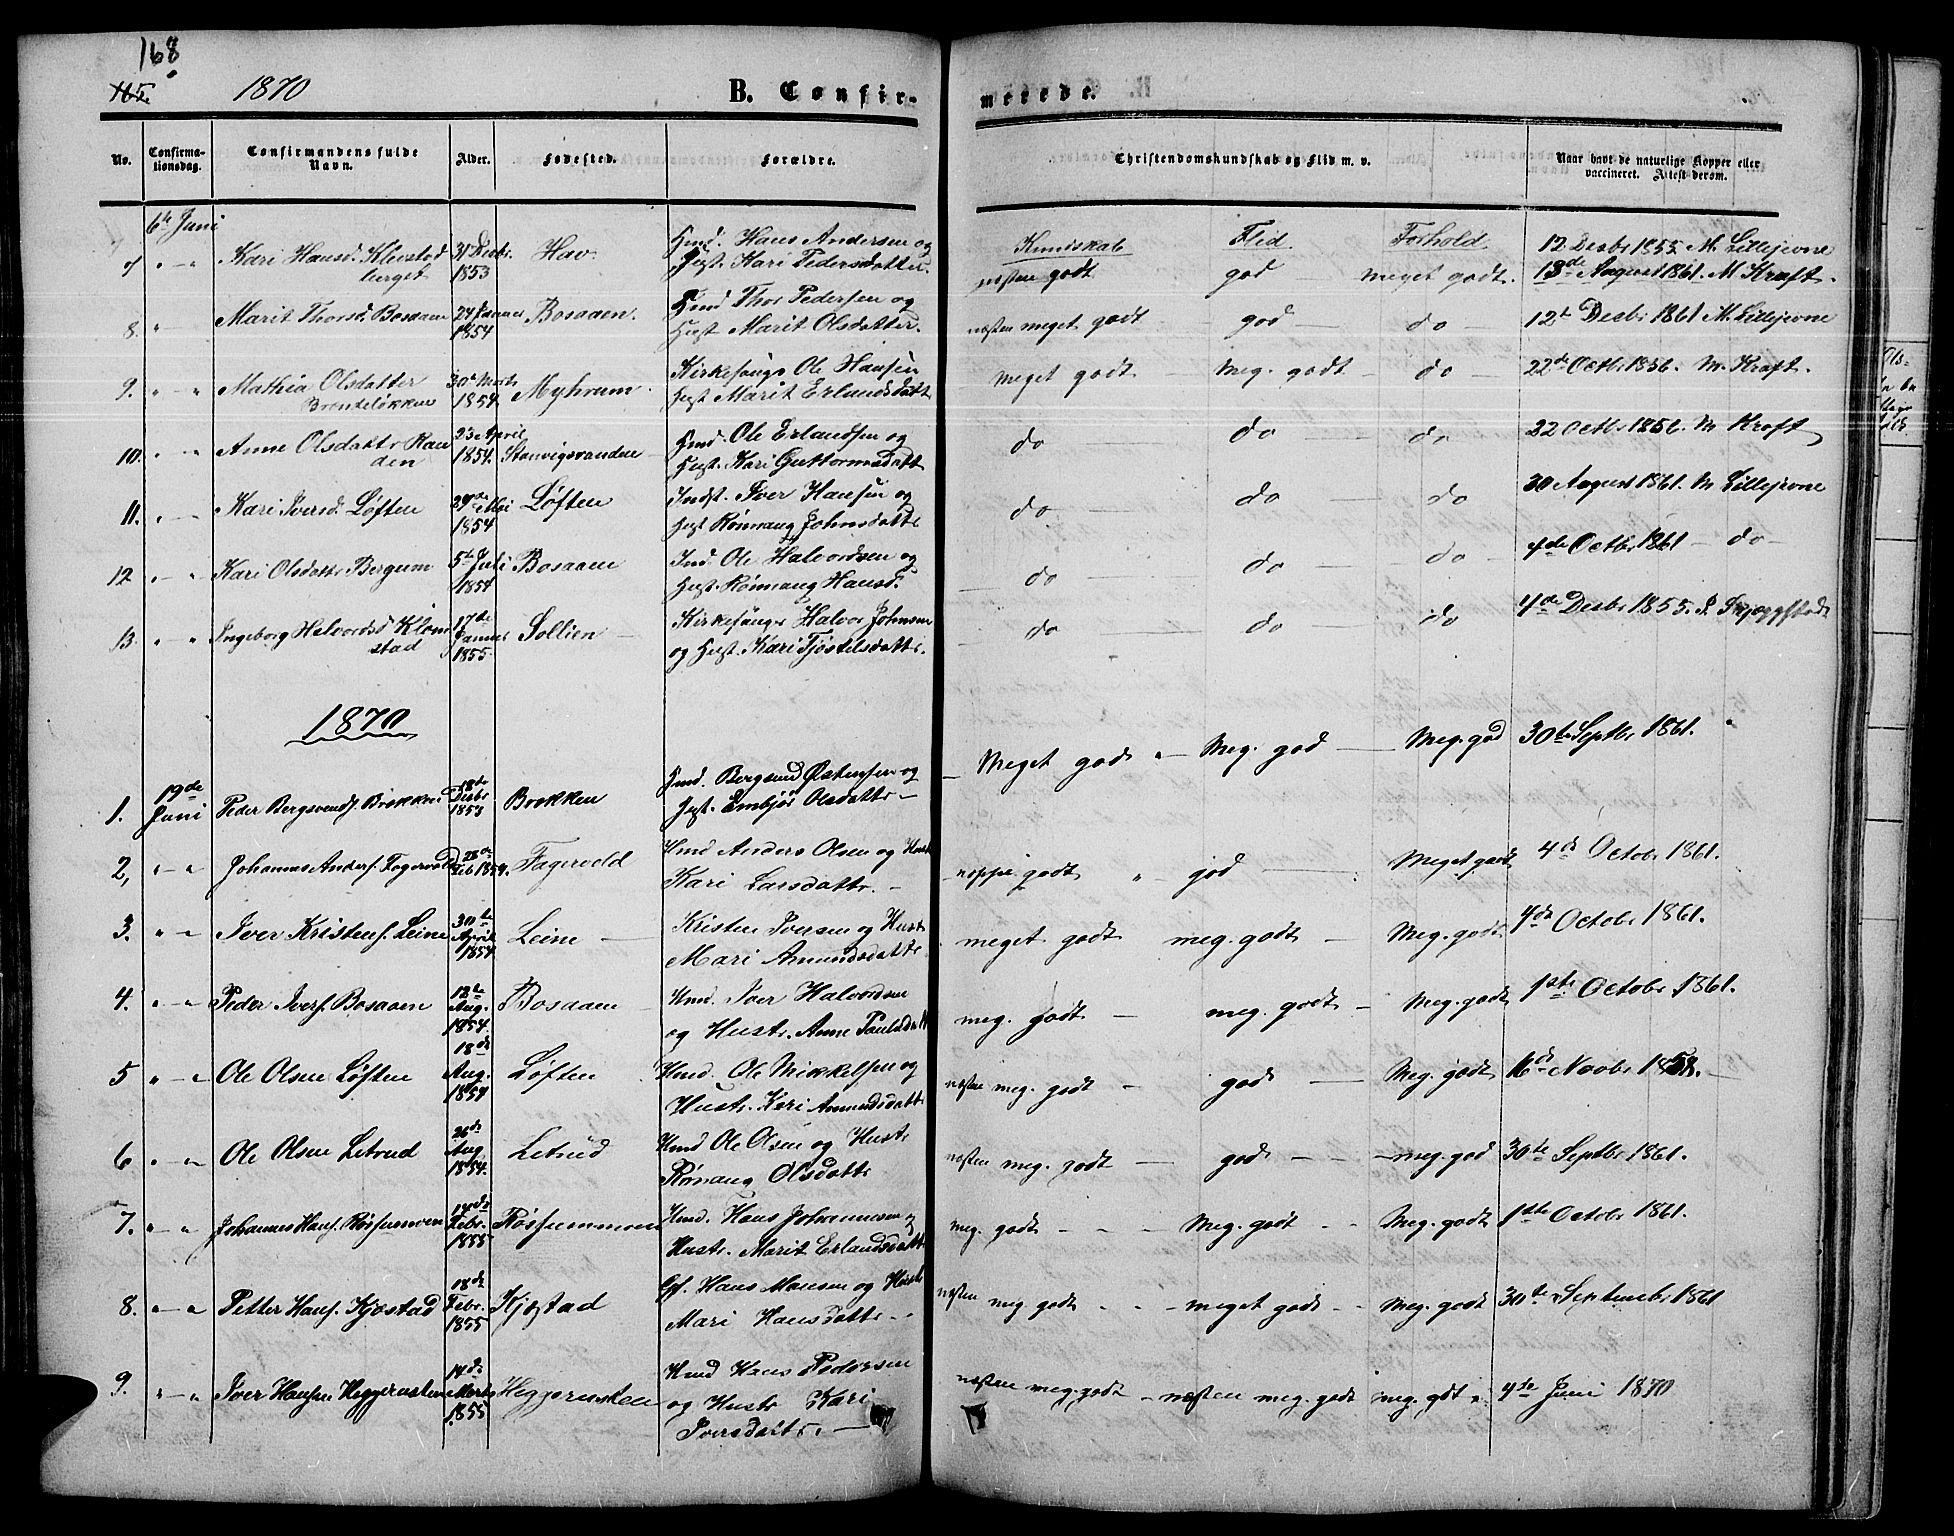 SAH, Nord-Fron prestekontor, Klokkerbok nr. 3, 1851-1886, s. 168